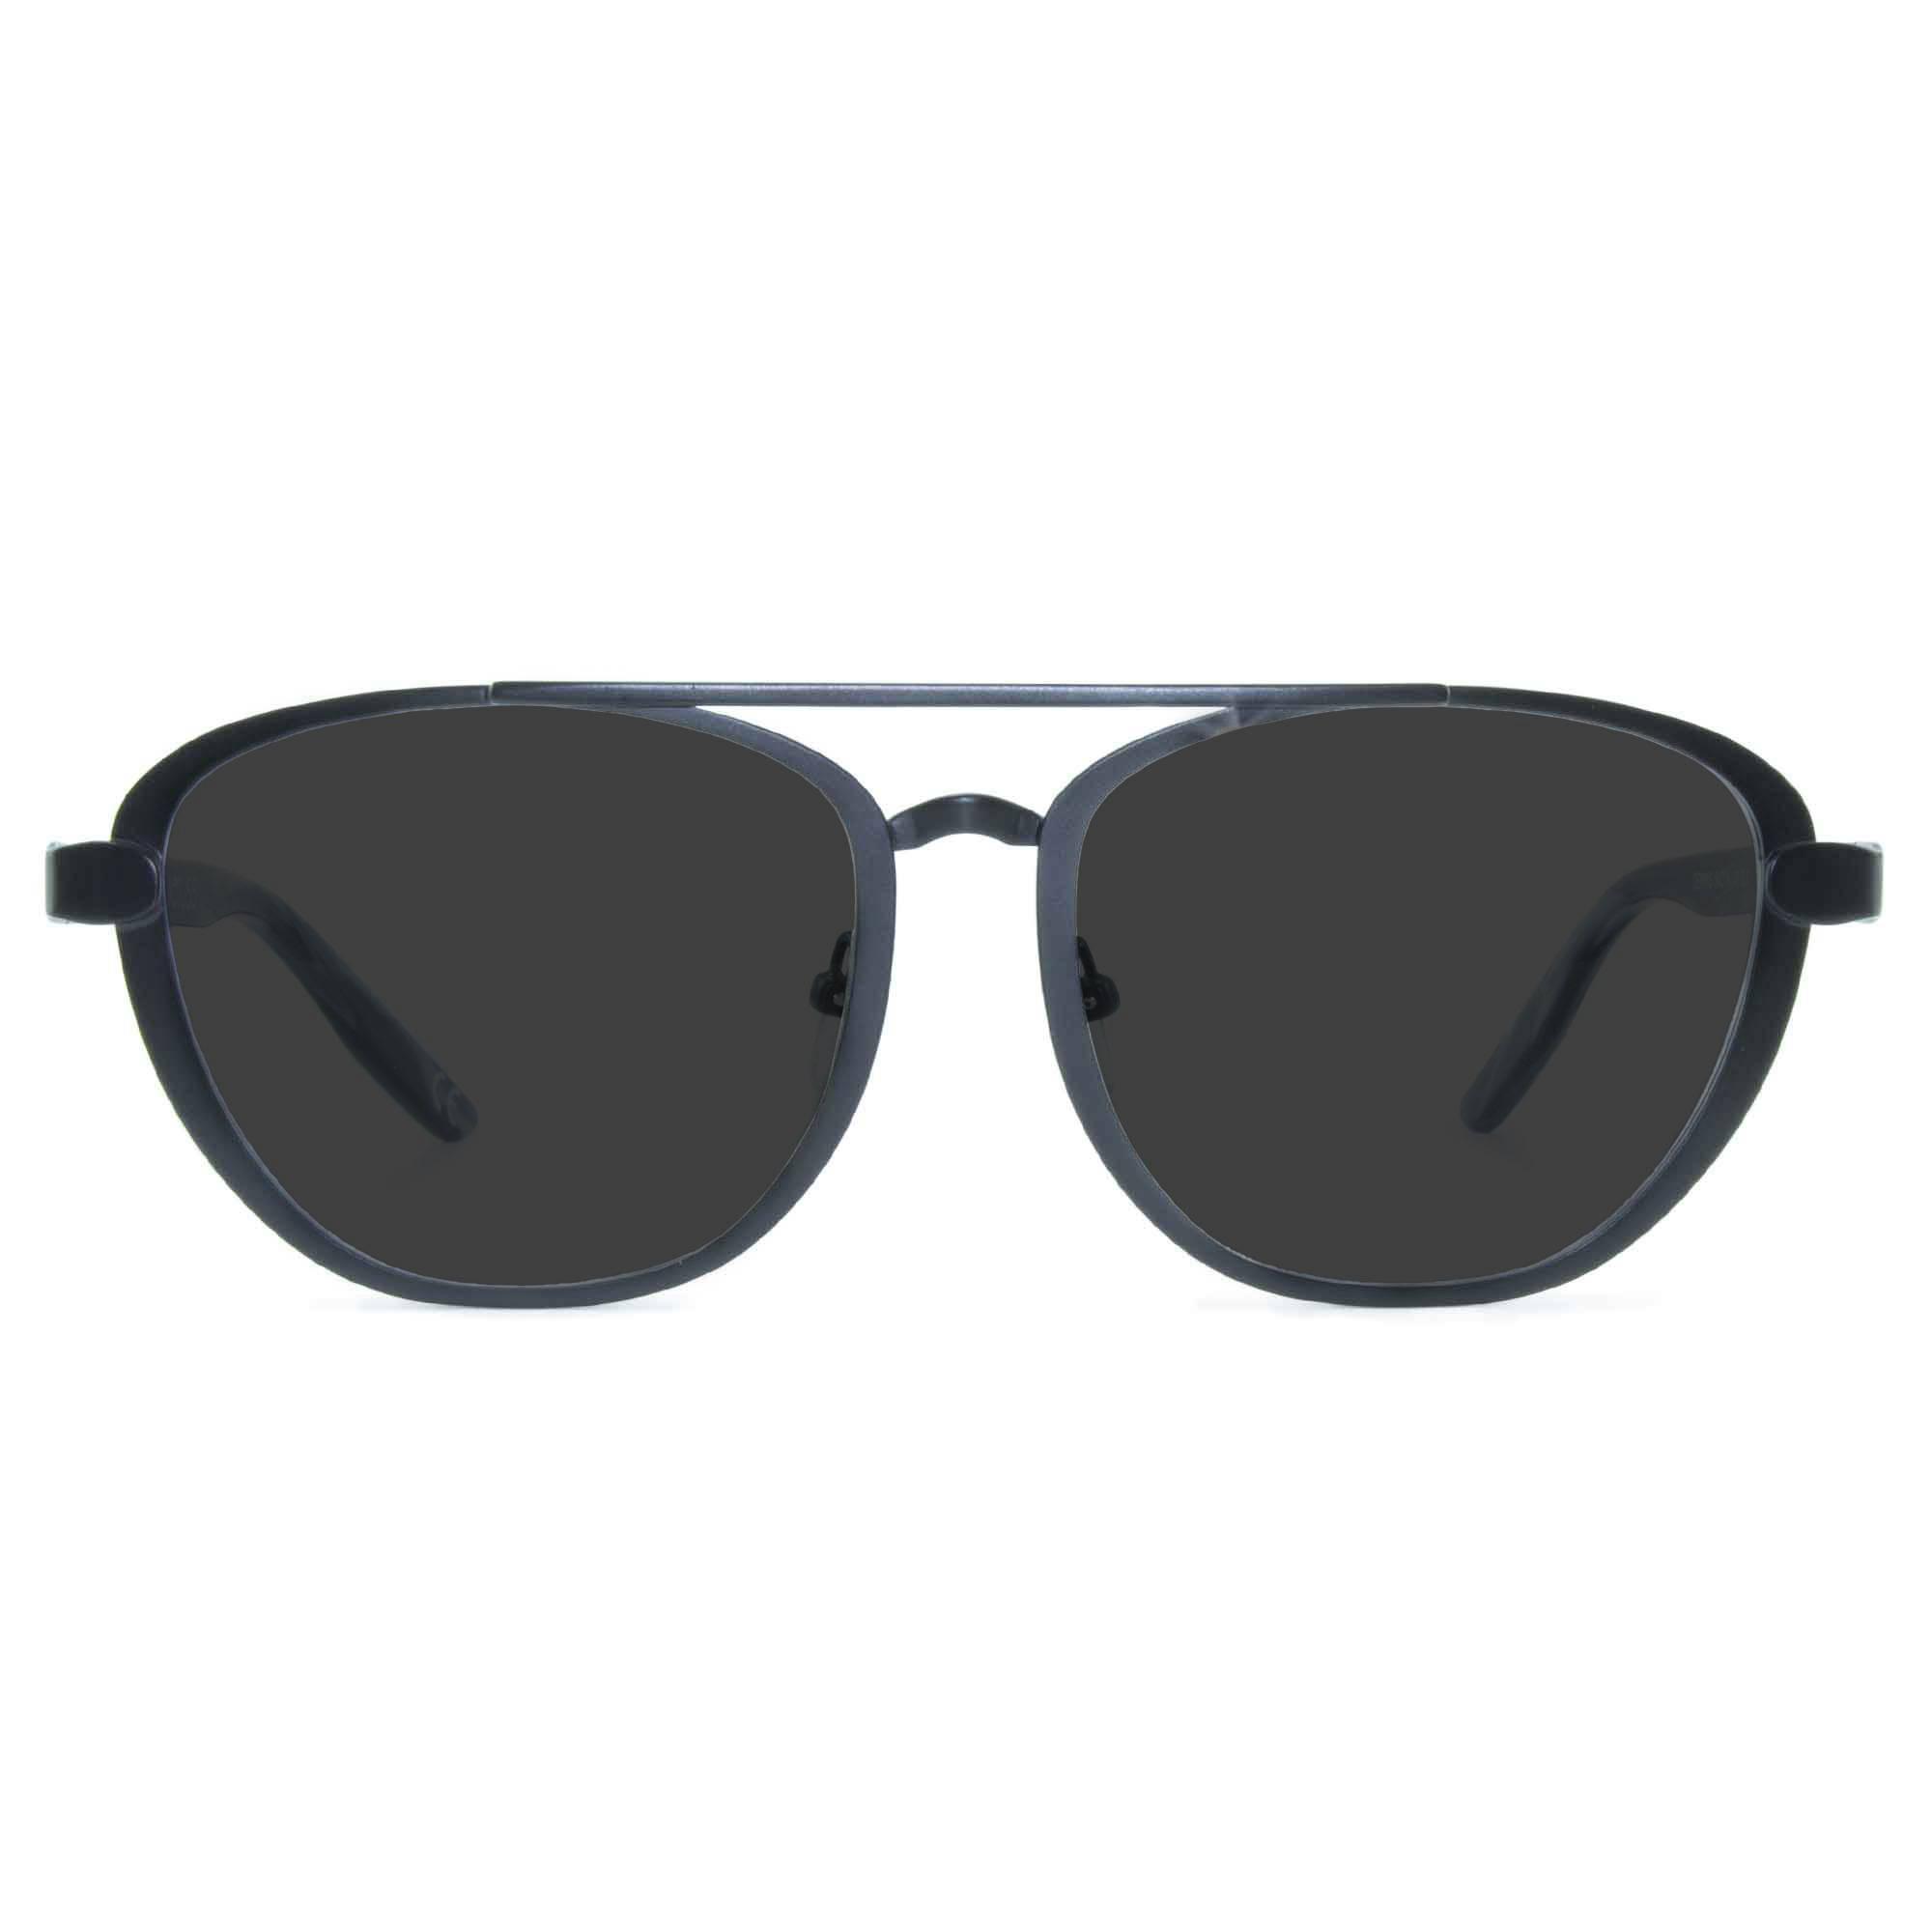 Joiuss dennis black aviator sunglasses